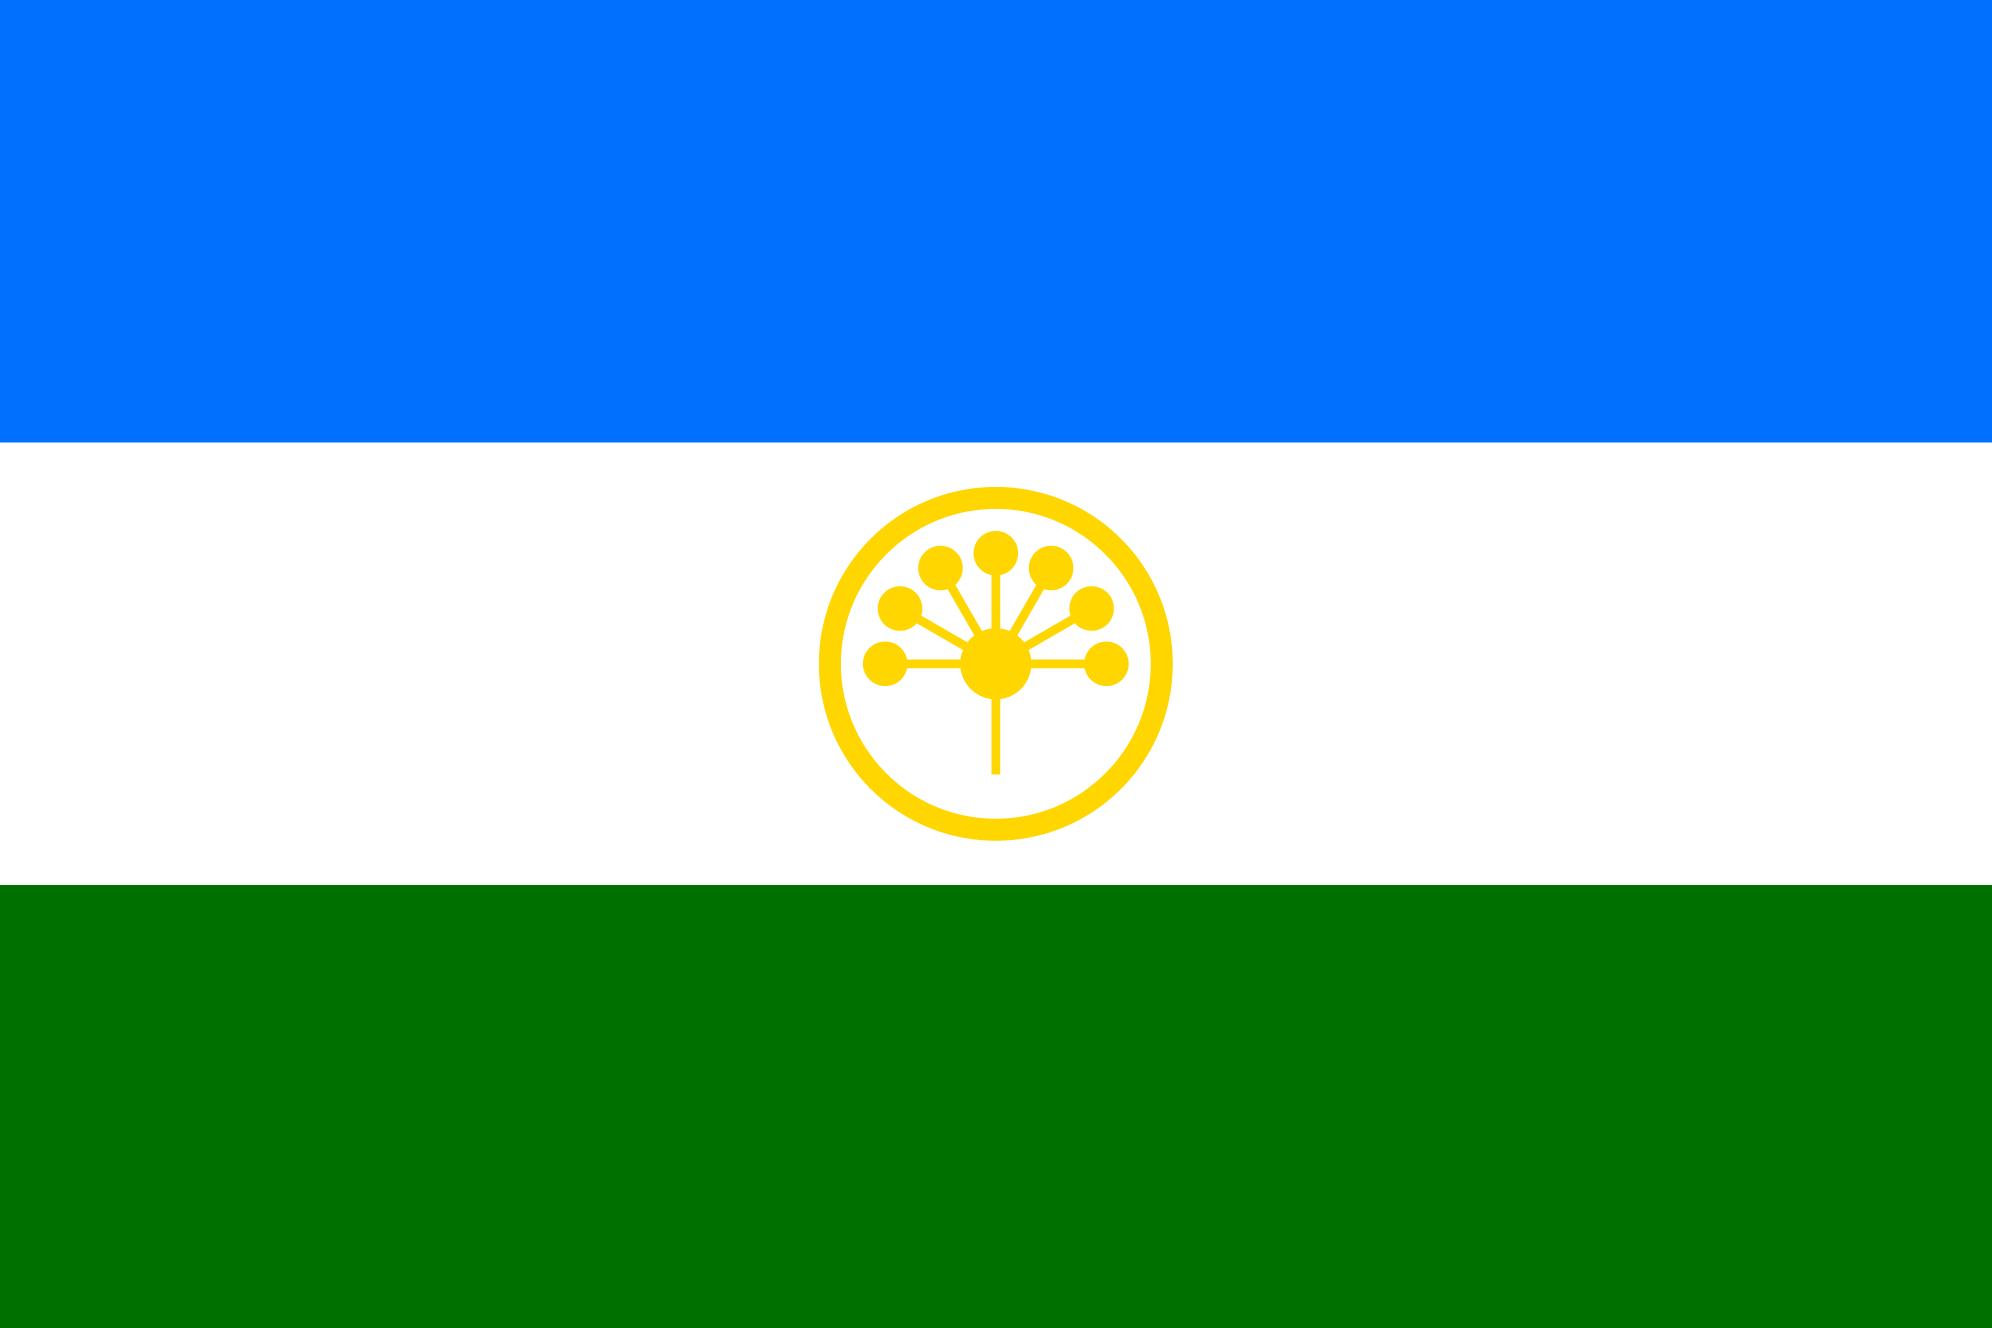 Флаг Республики Башкортостан